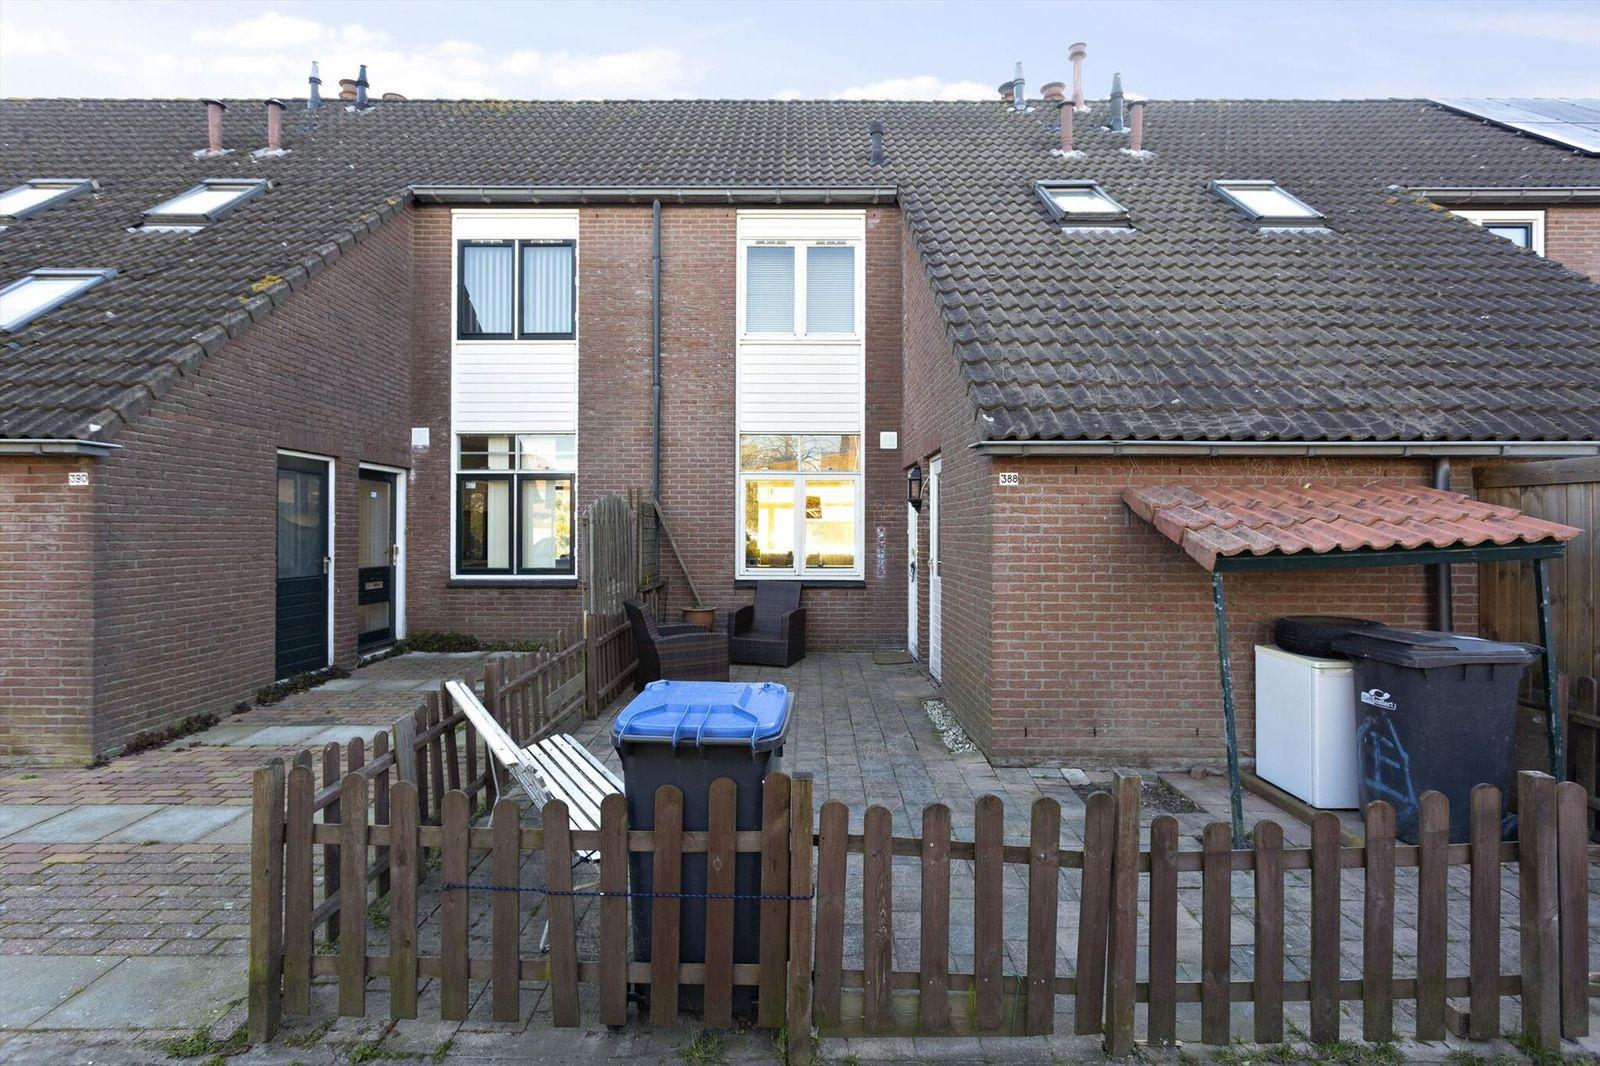 Ringdijk 388, Lelystad